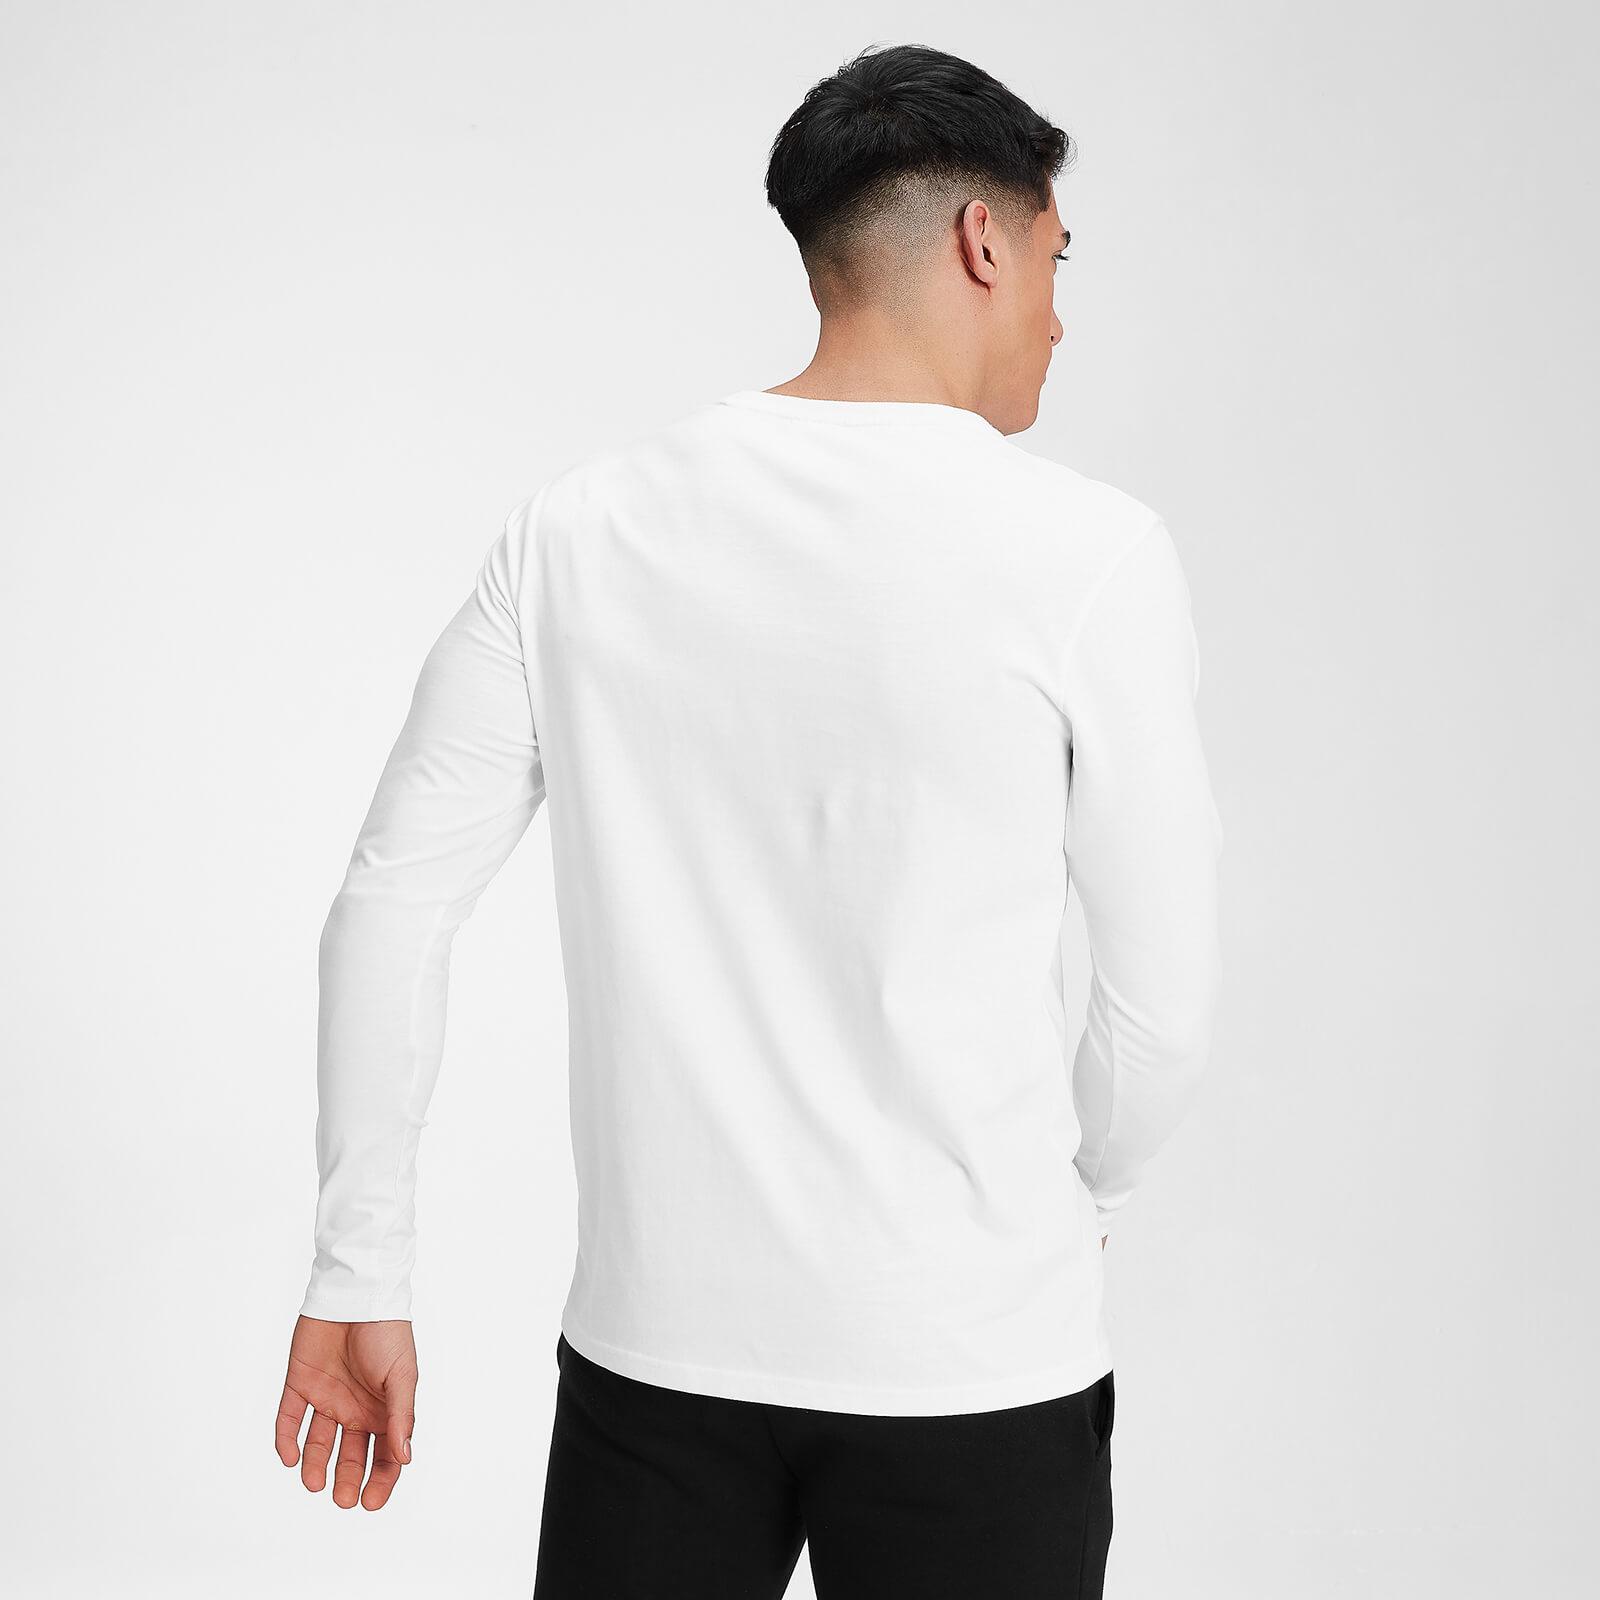 Mp Men's Outline Graphic Long Sleeve Top - White - Xxs